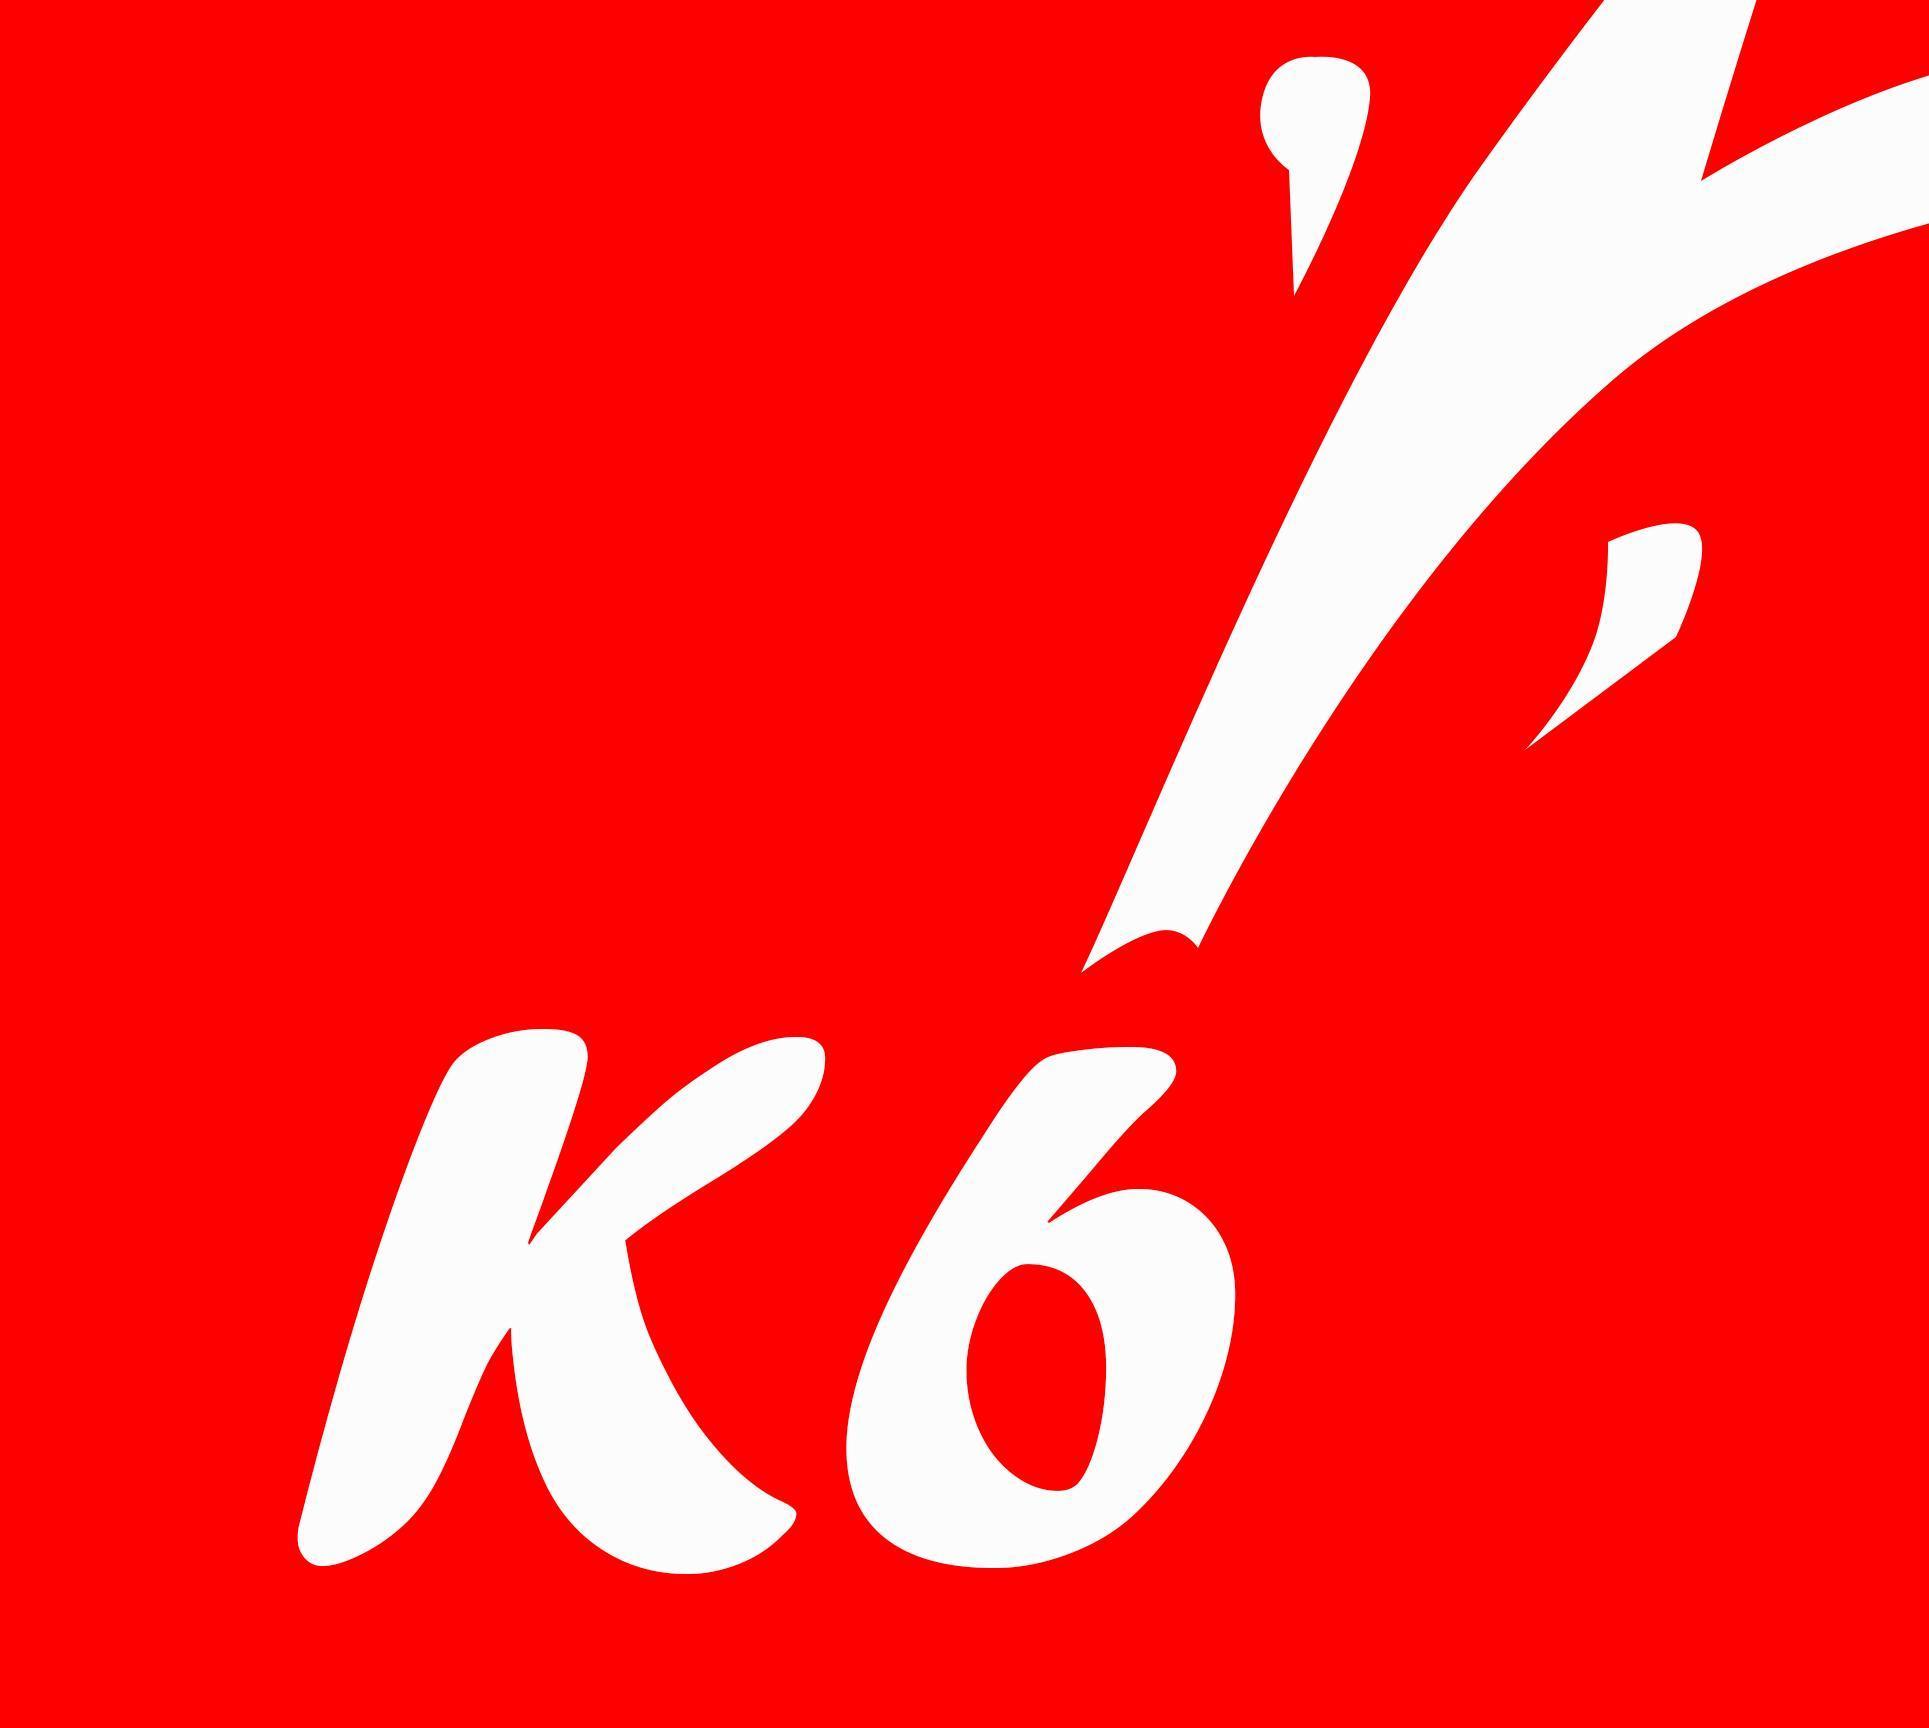 Kamelo6?s=u7os2vfr2kb5lag8u+o4blgicyesm2fbh8qwehc4io8=